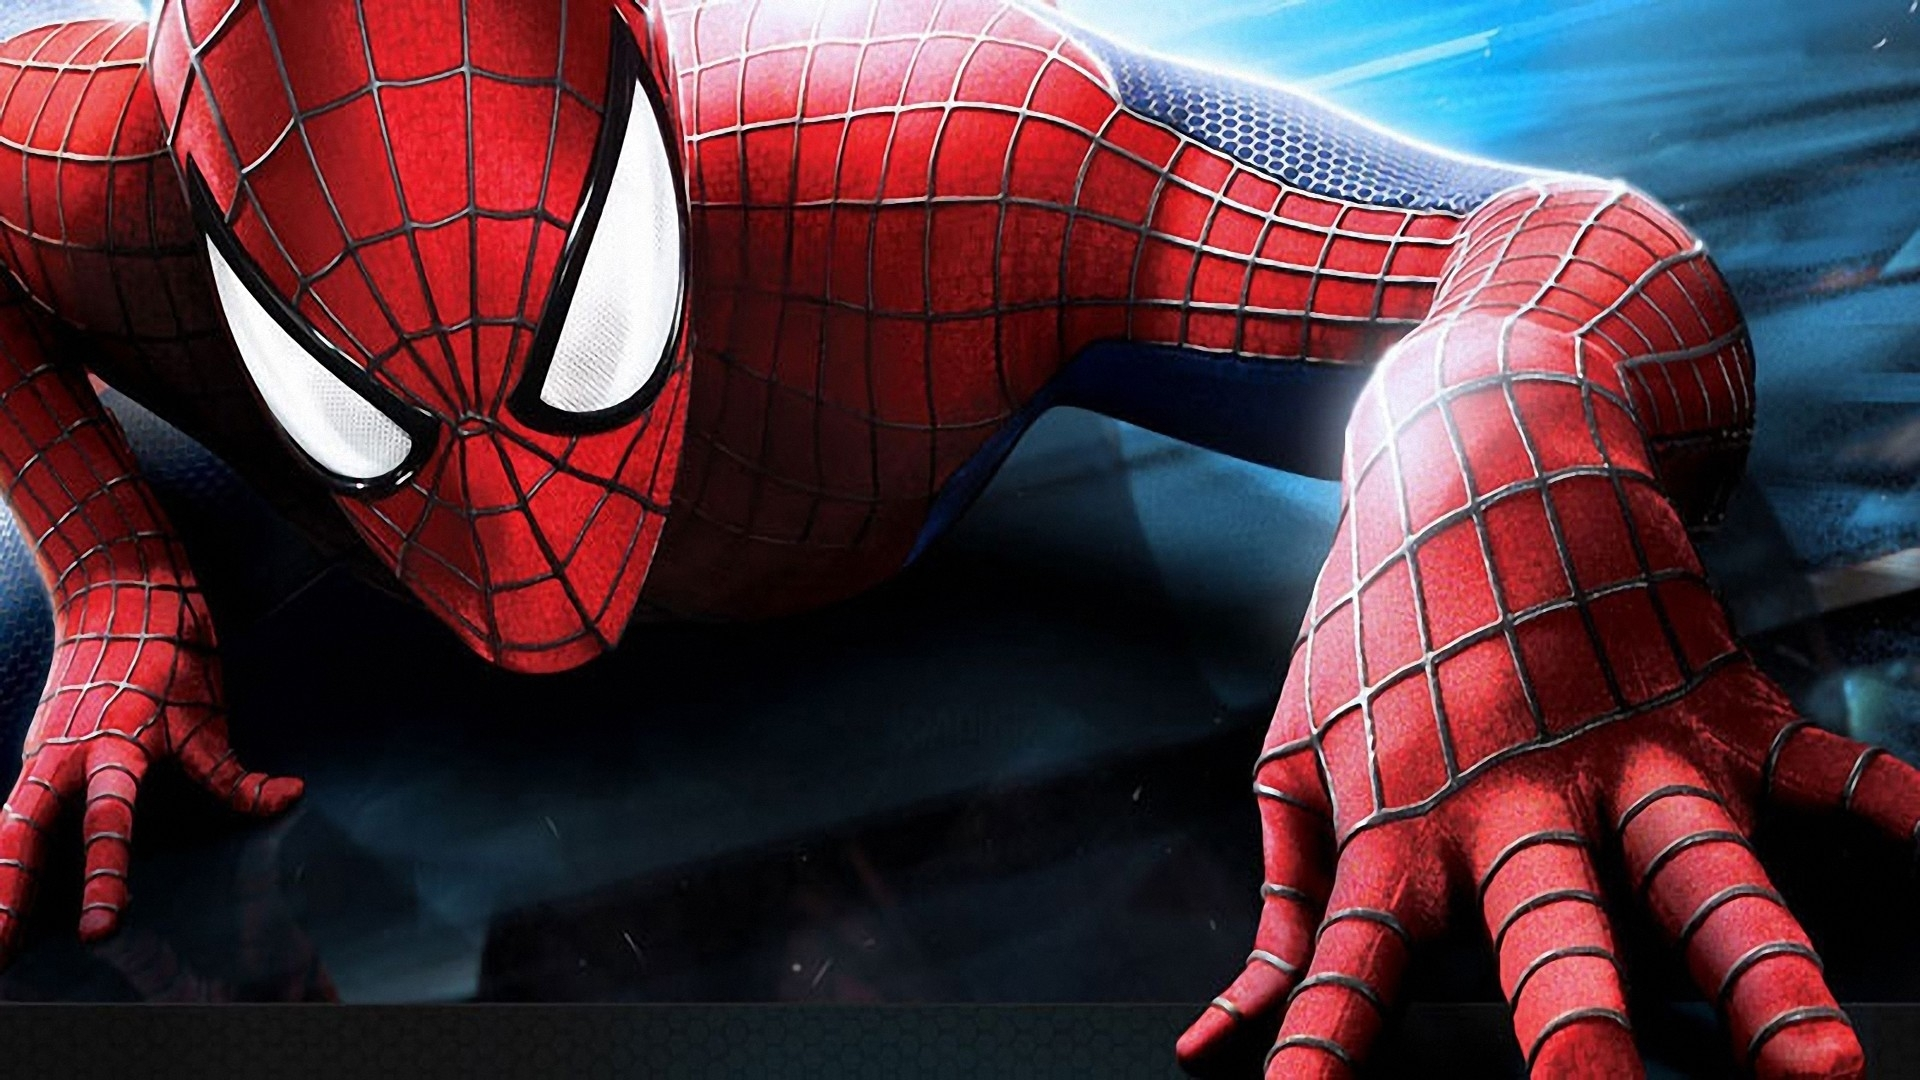 10 Most Popular Spider Man 2099 Wallpaper Hd Full Hd 1920: 10 New Ultimate Spider-Man Wallpaper FULL HD 1920×1080 For